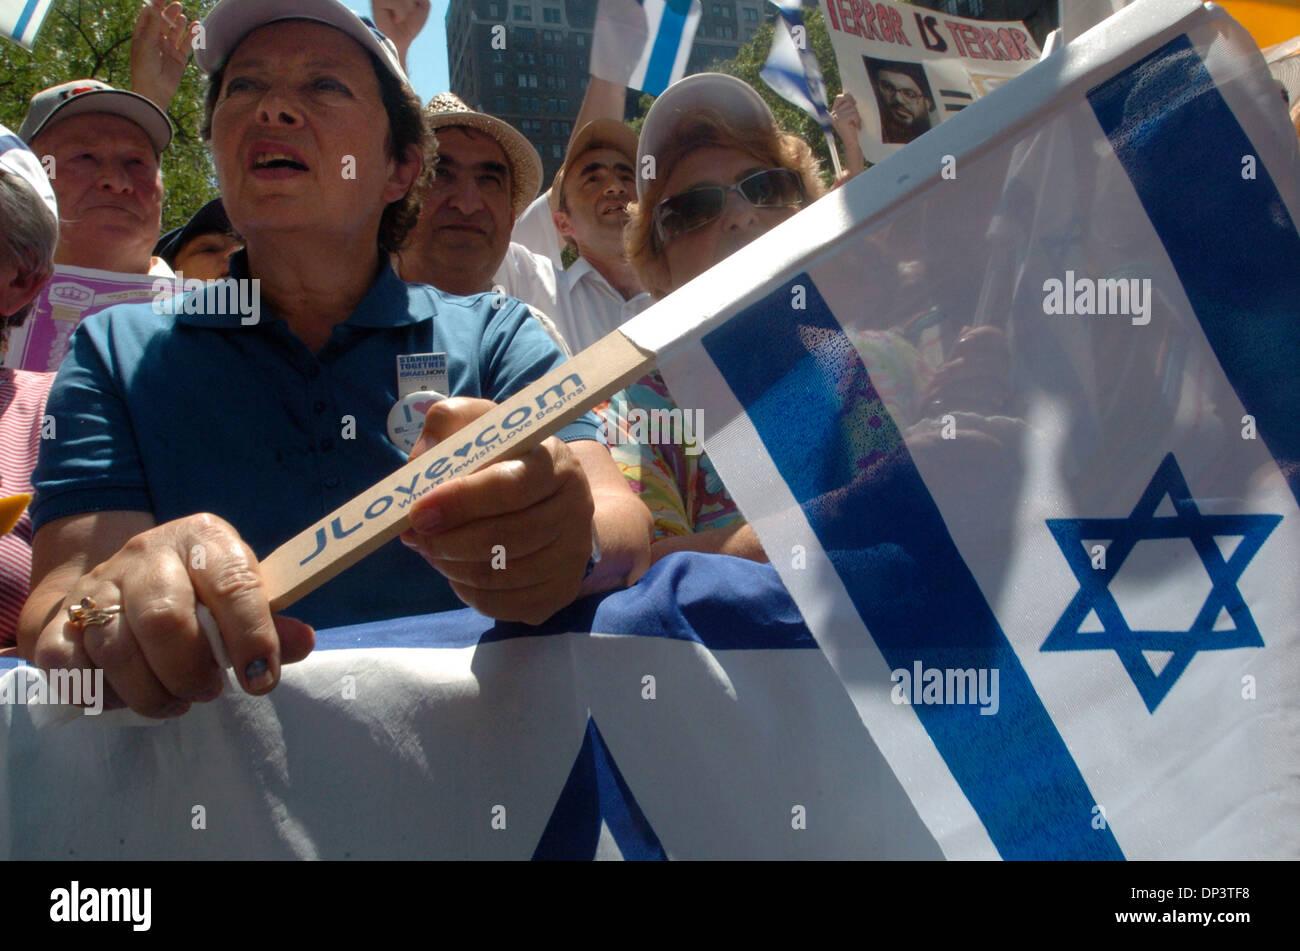 Jul 17, 2006; New York, NY, USA; PELLA AKHMECHET, of Brooklyn waves an Israeli flag as hundreds of supporters turn - Stock Image